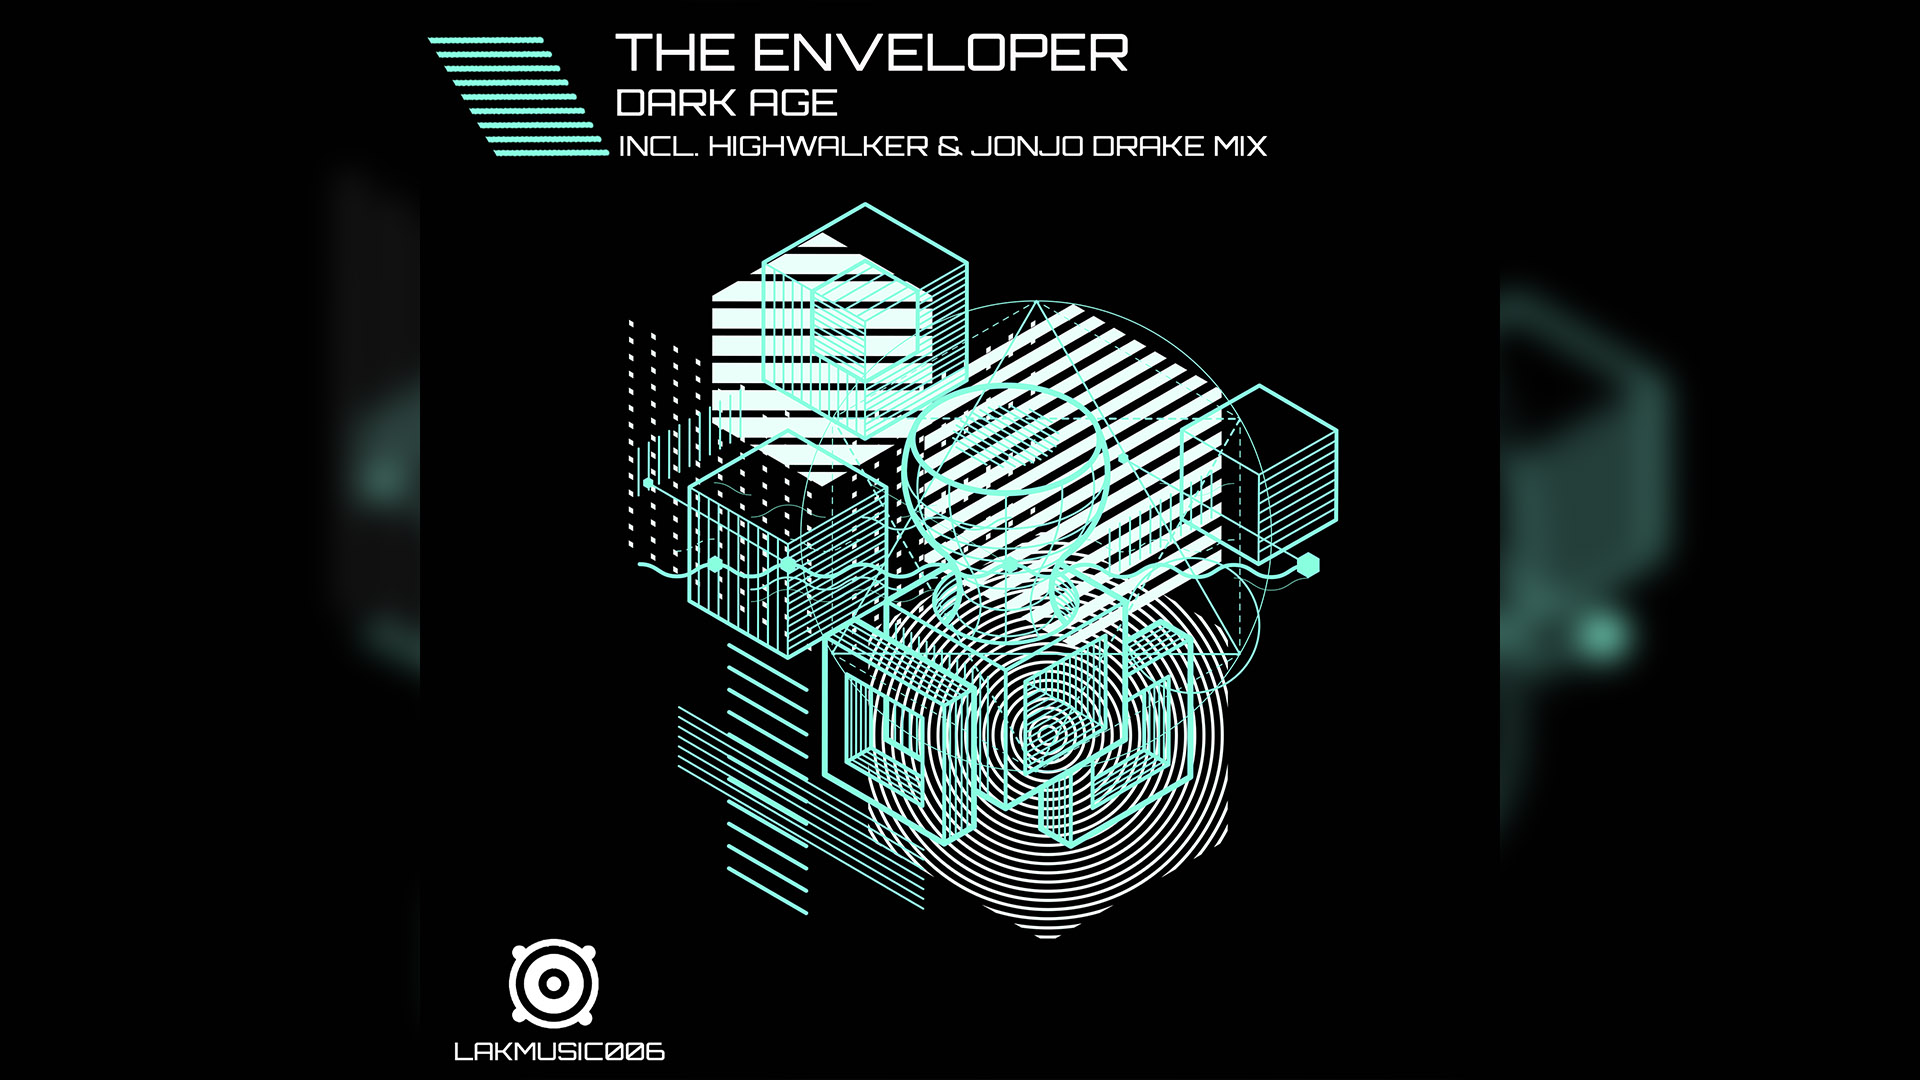 The Enveloper - Dark Age